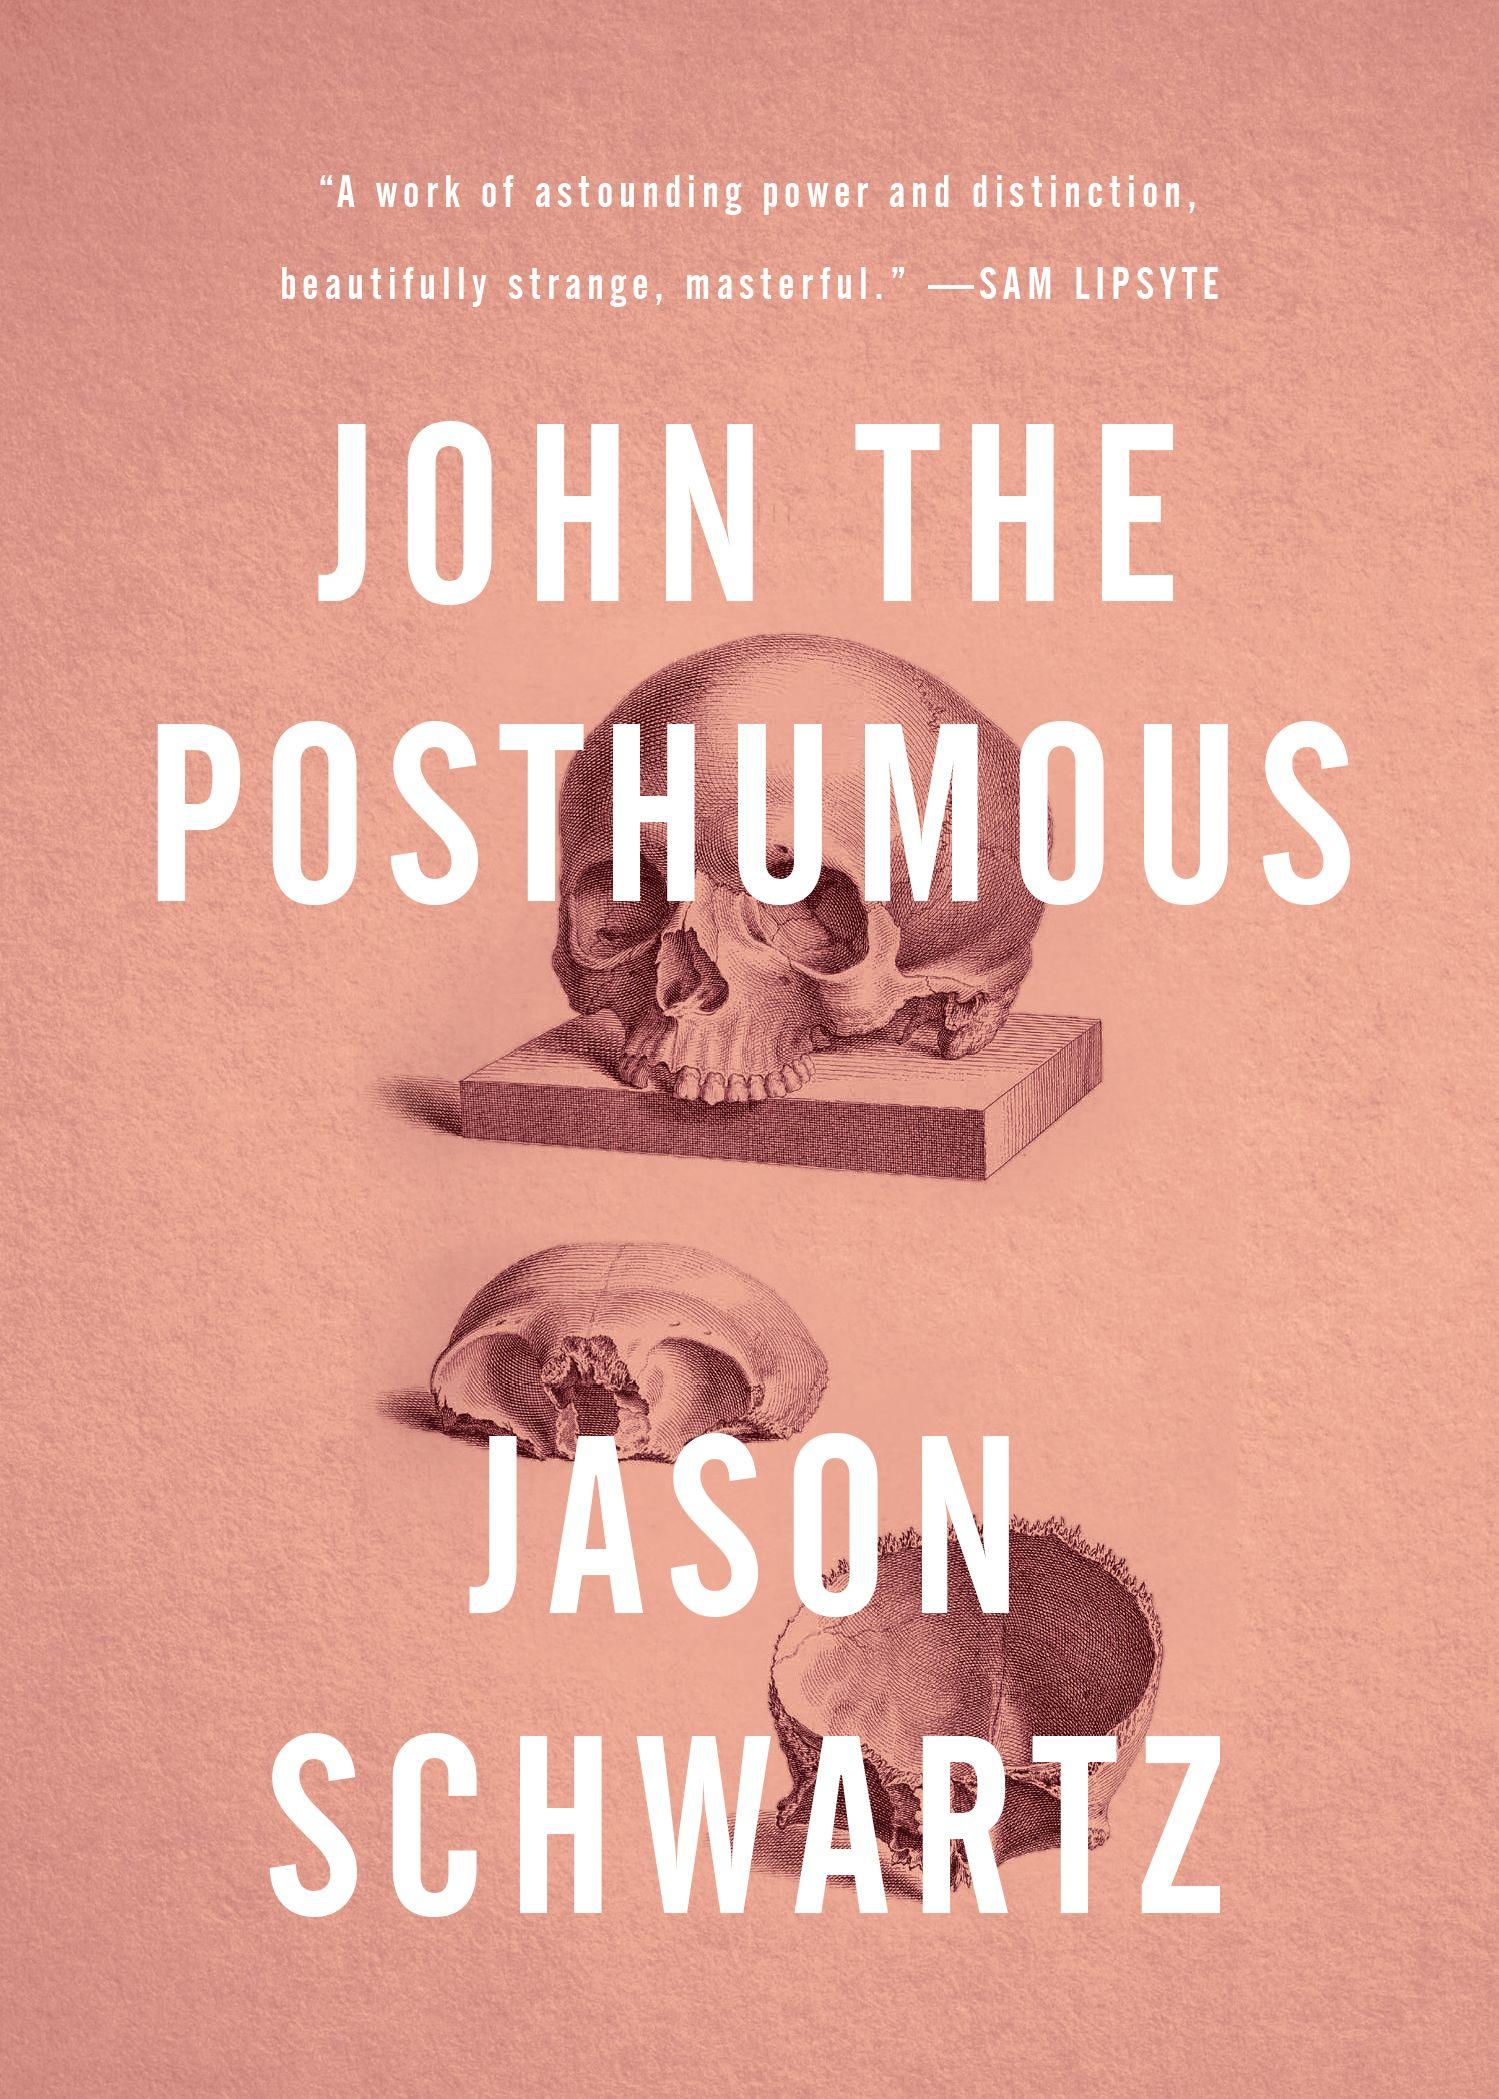 John the Posthumous: A Fiction | Literature | Books, Book, magazine